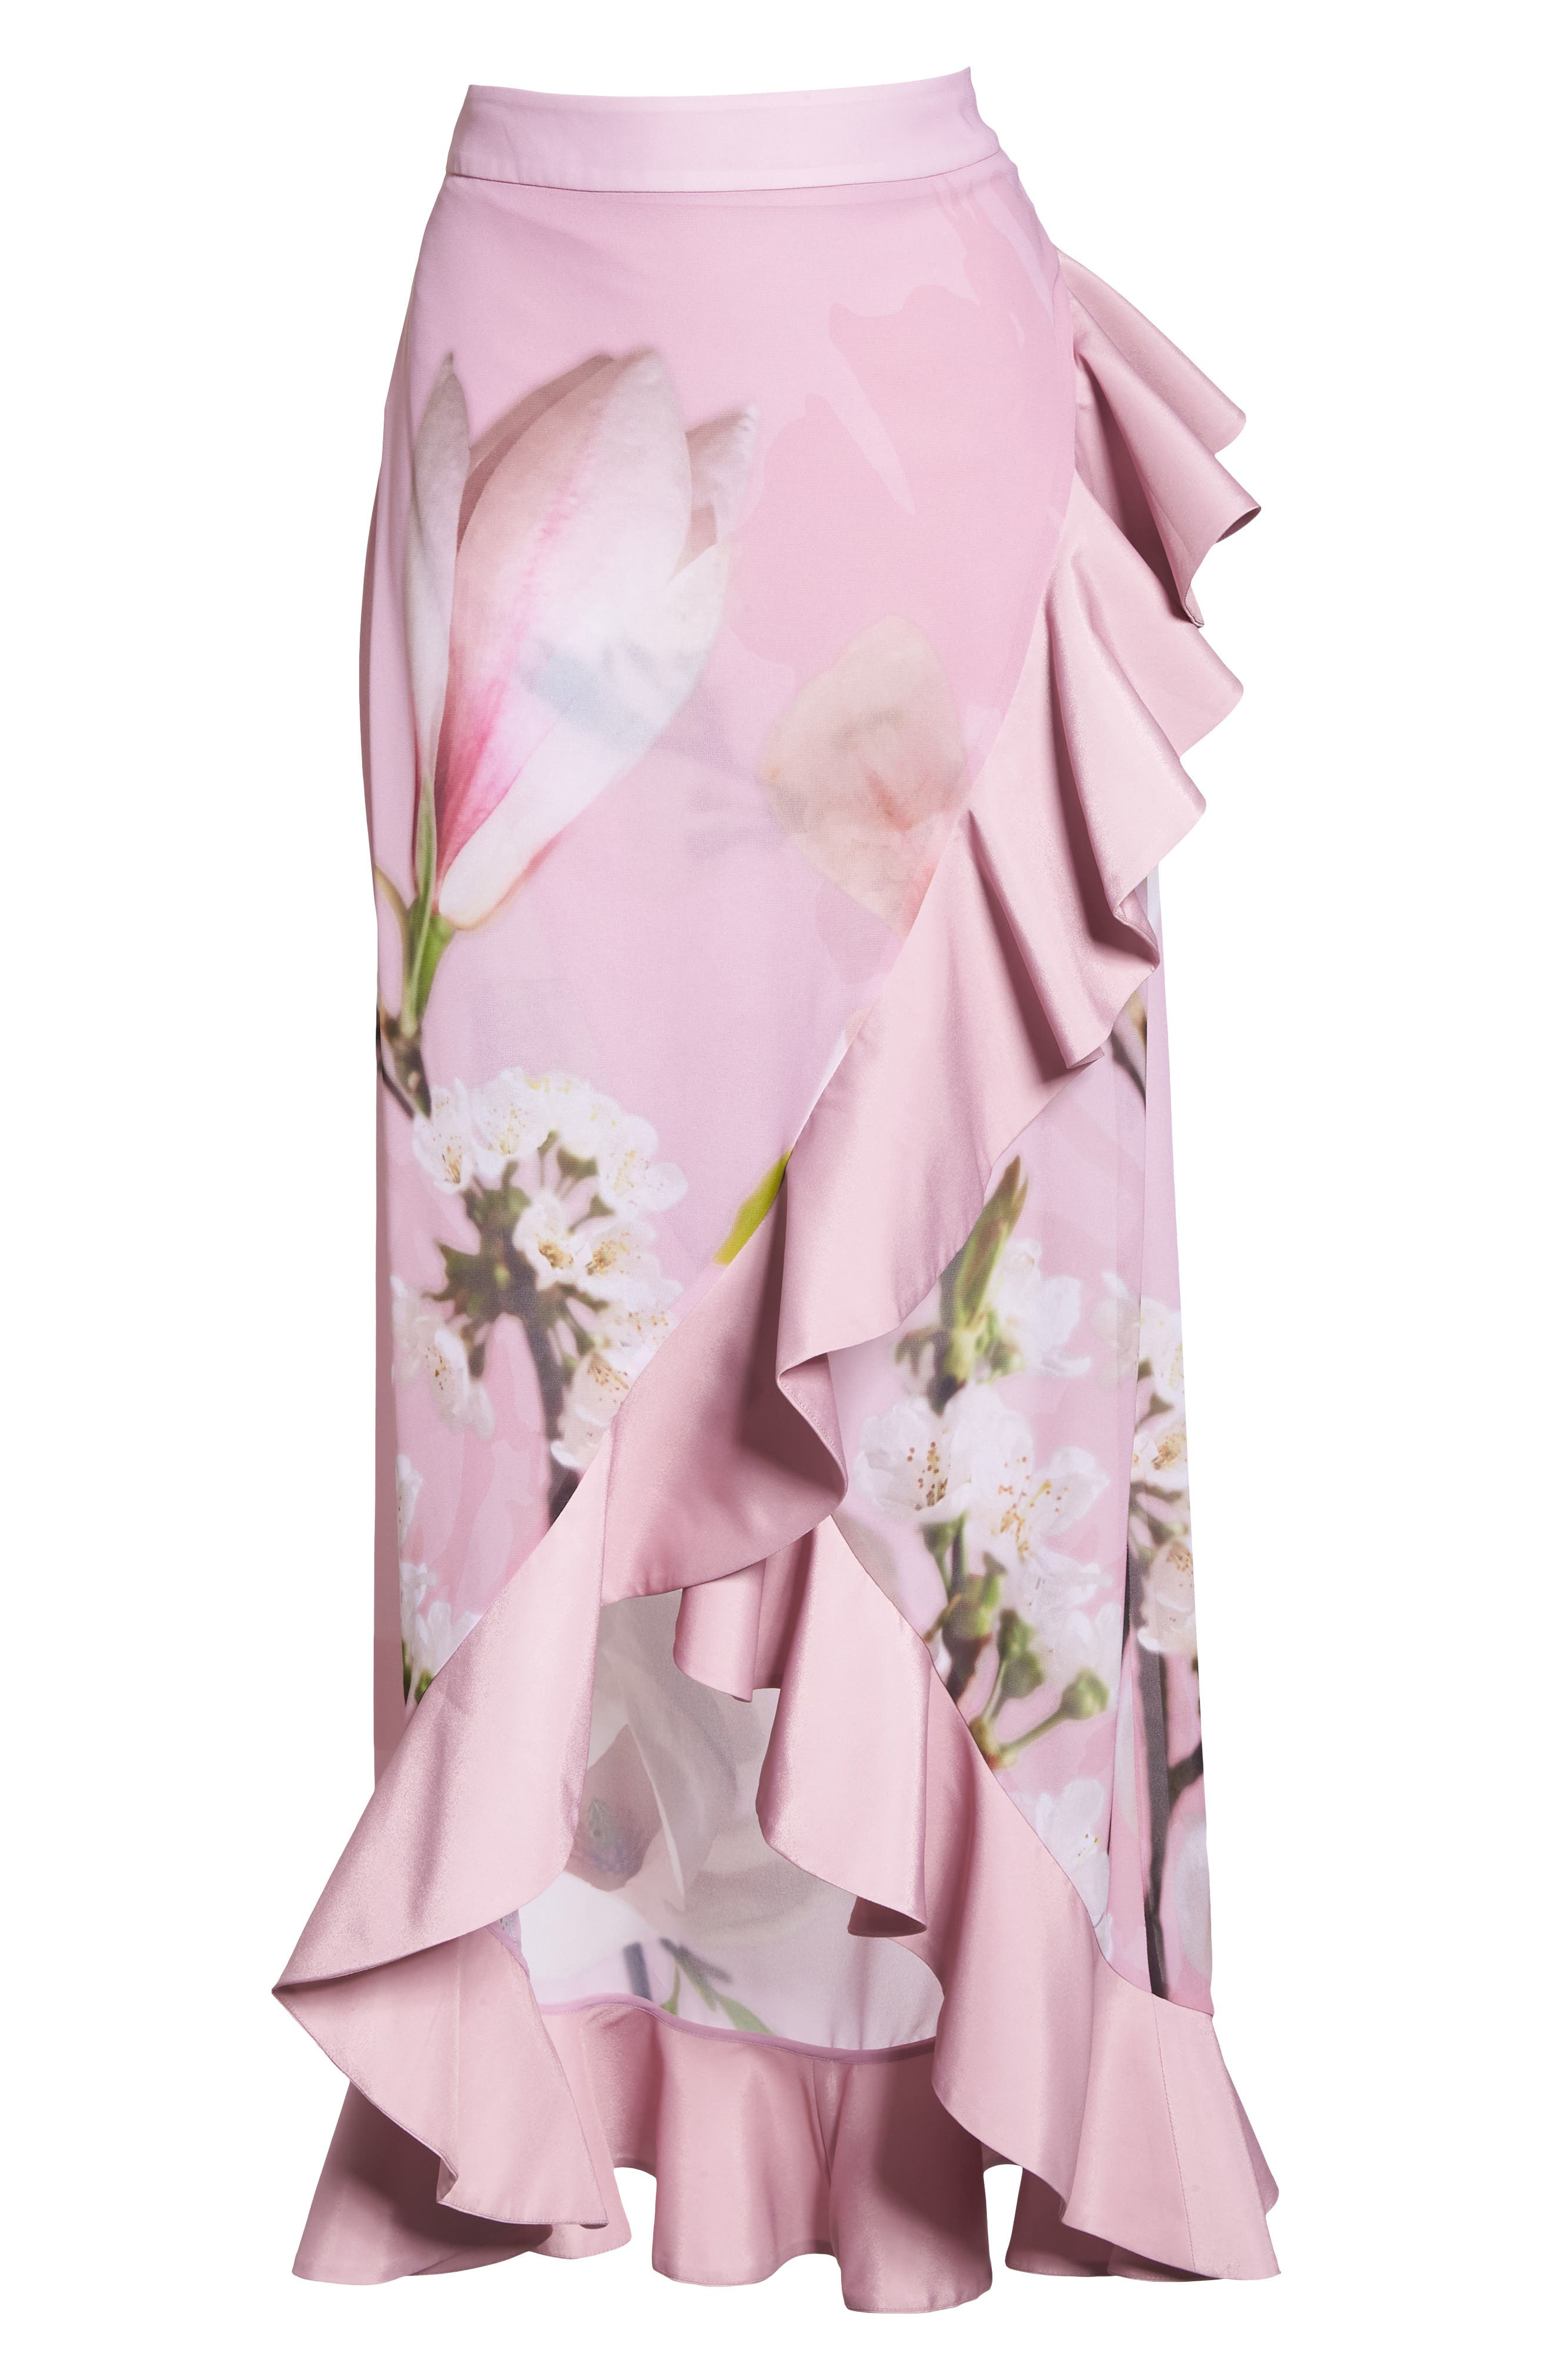 Harmony Cover-Up Skirt,                             Alternate thumbnail 6, color,                             Dusky Pink